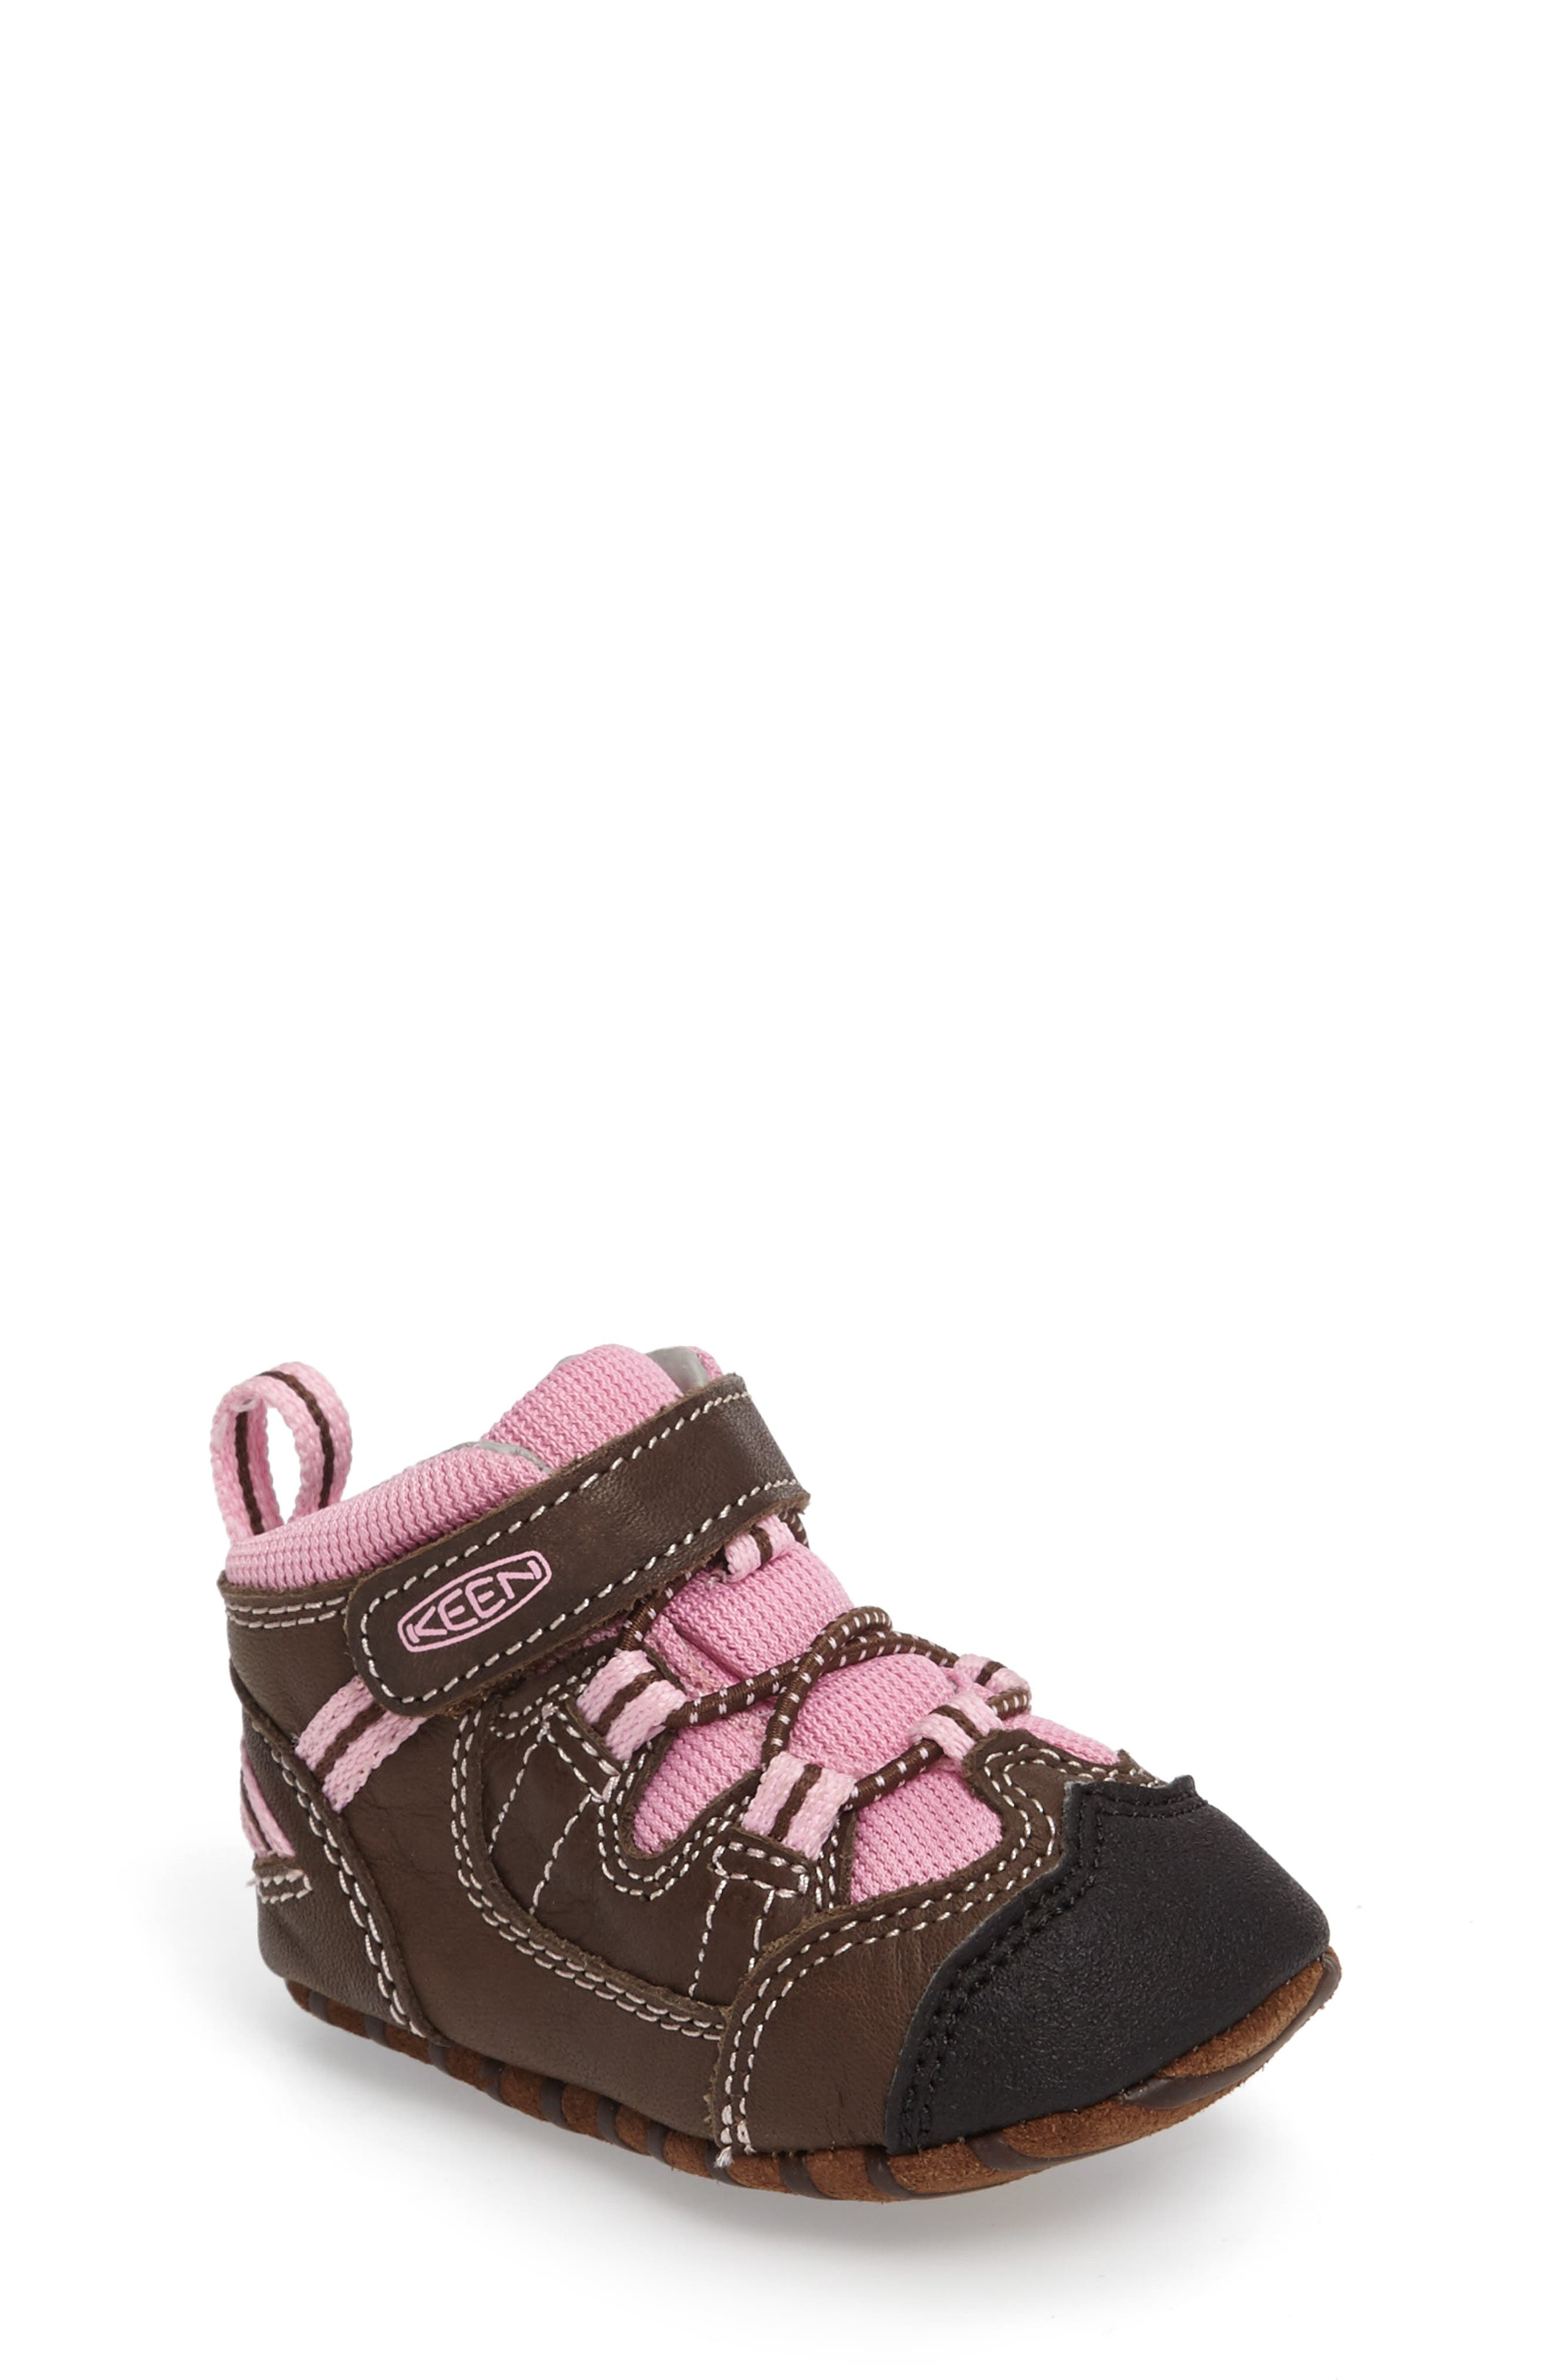 Targhee Crib Shoe,                             Main thumbnail 1, color,                             204